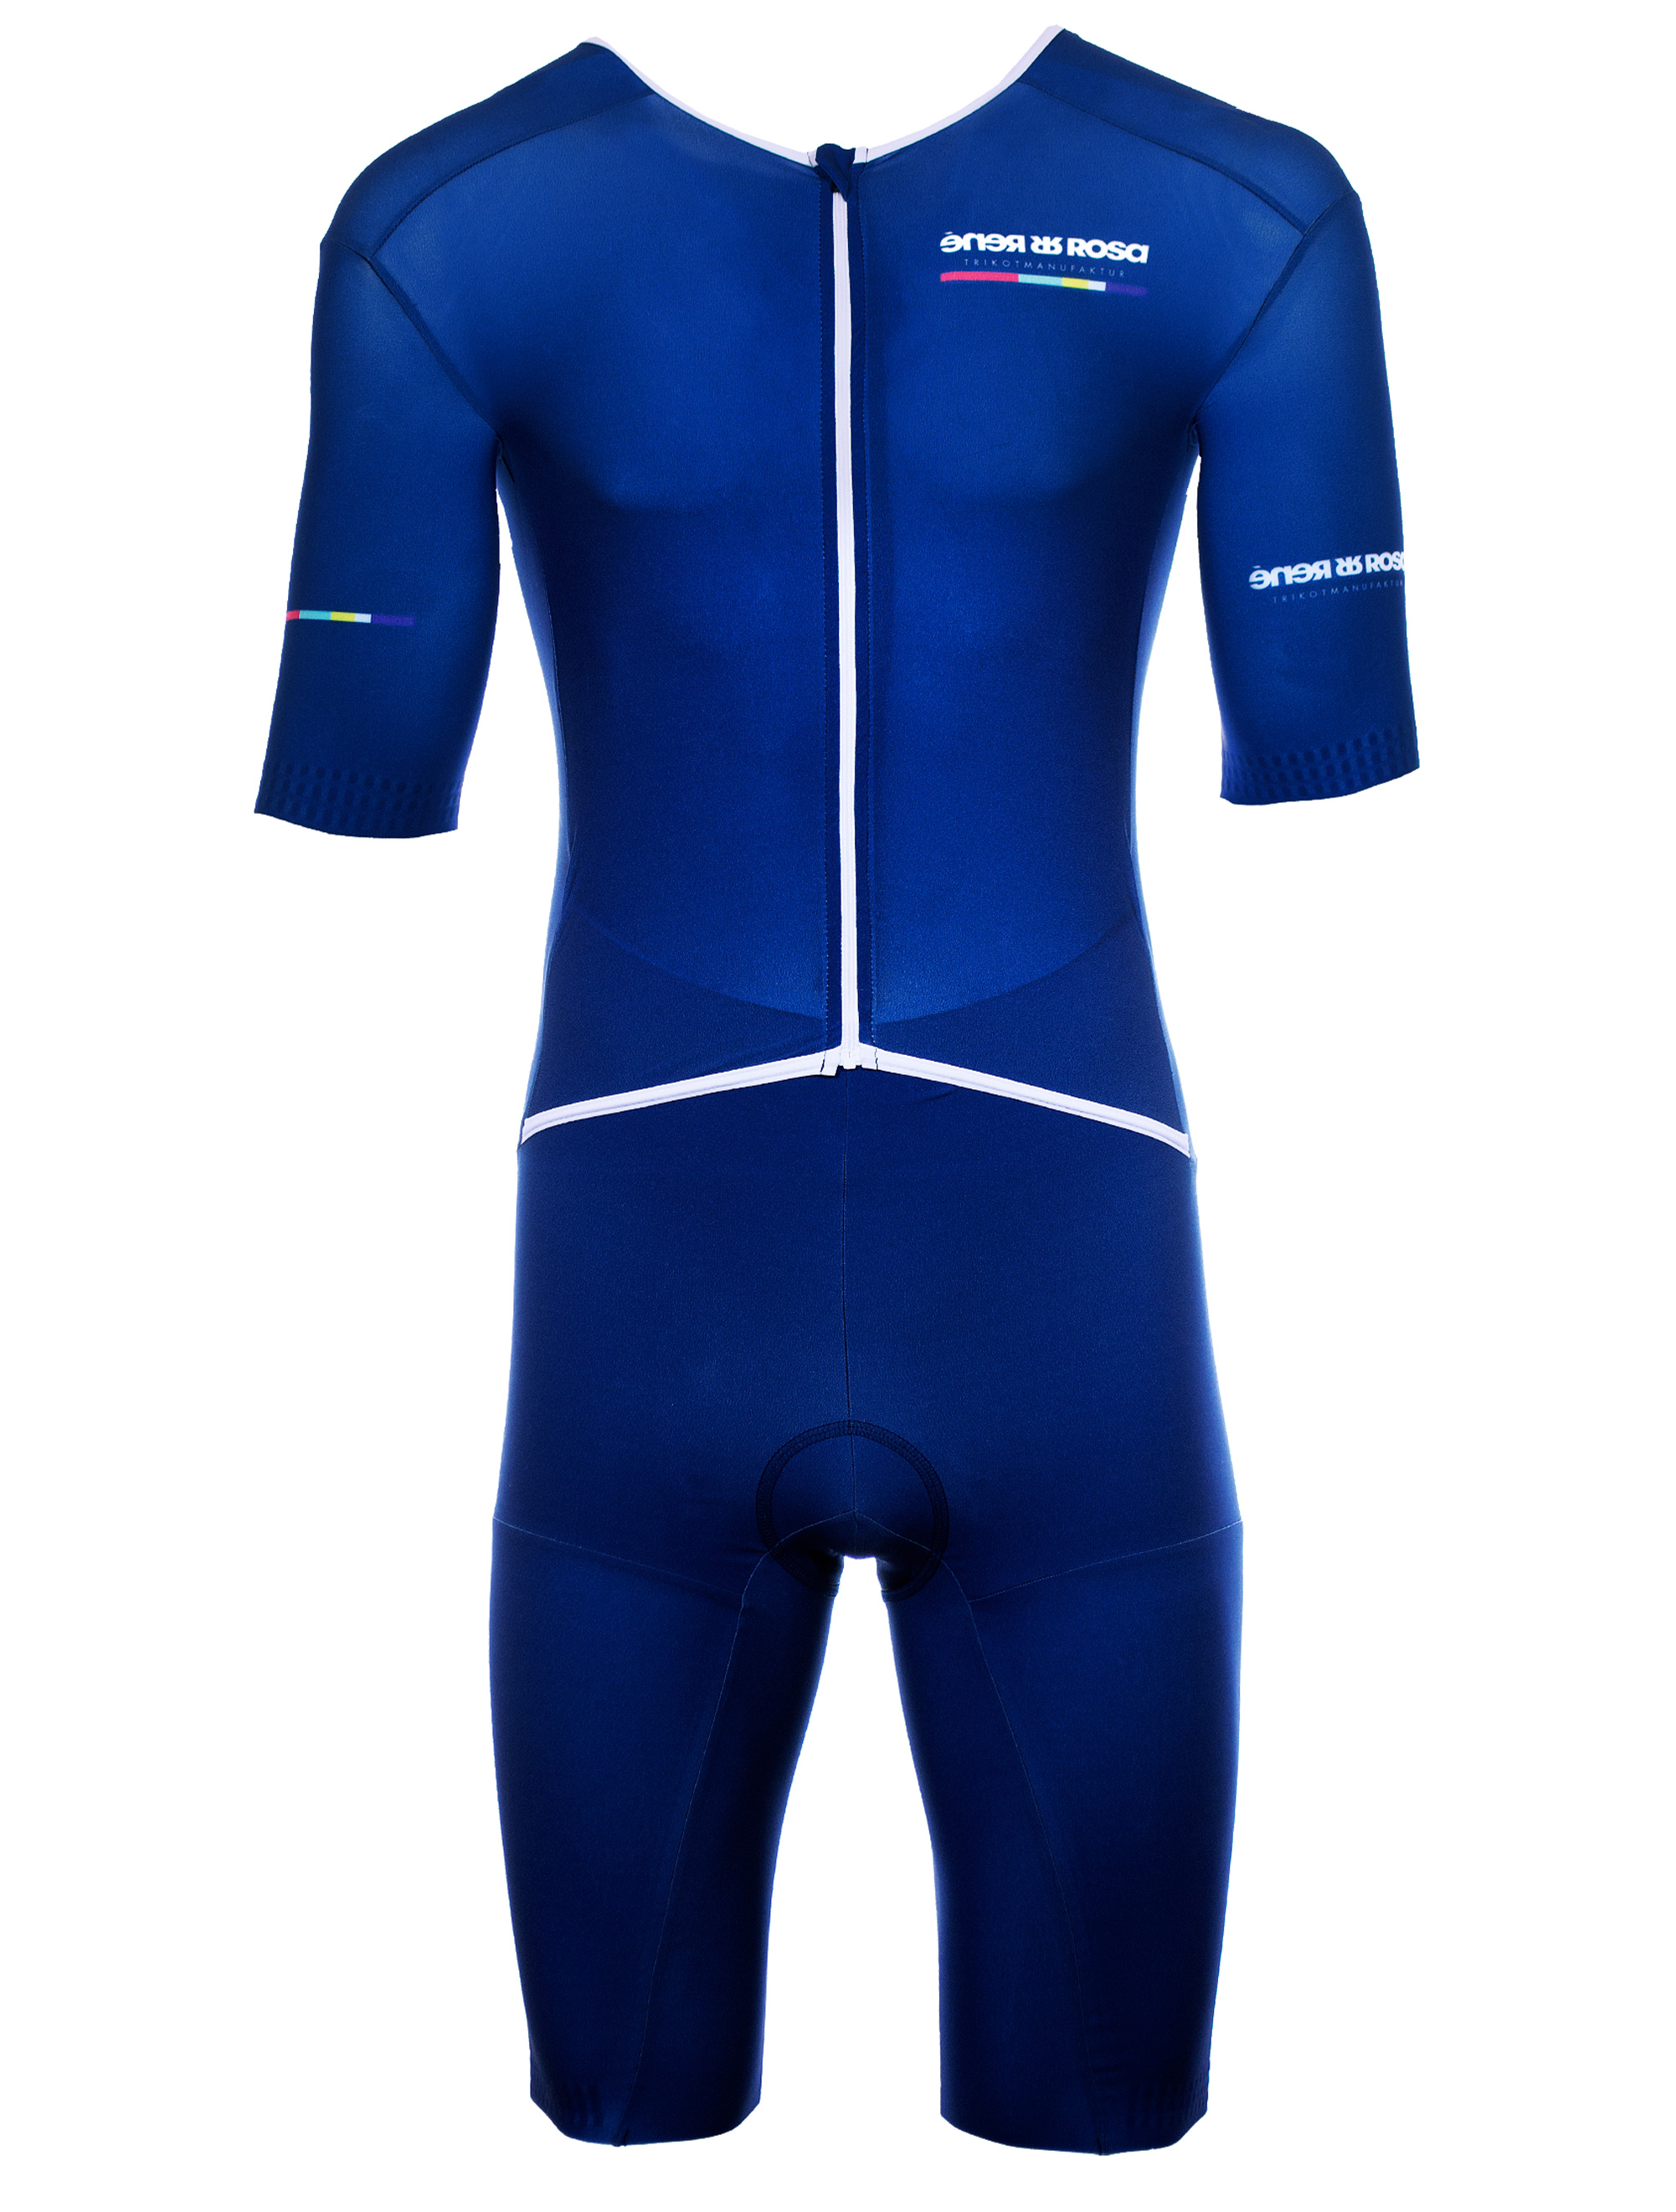 Aero Triathlon Einteiler  RRT2777M Longversion / RR-Stripes blau